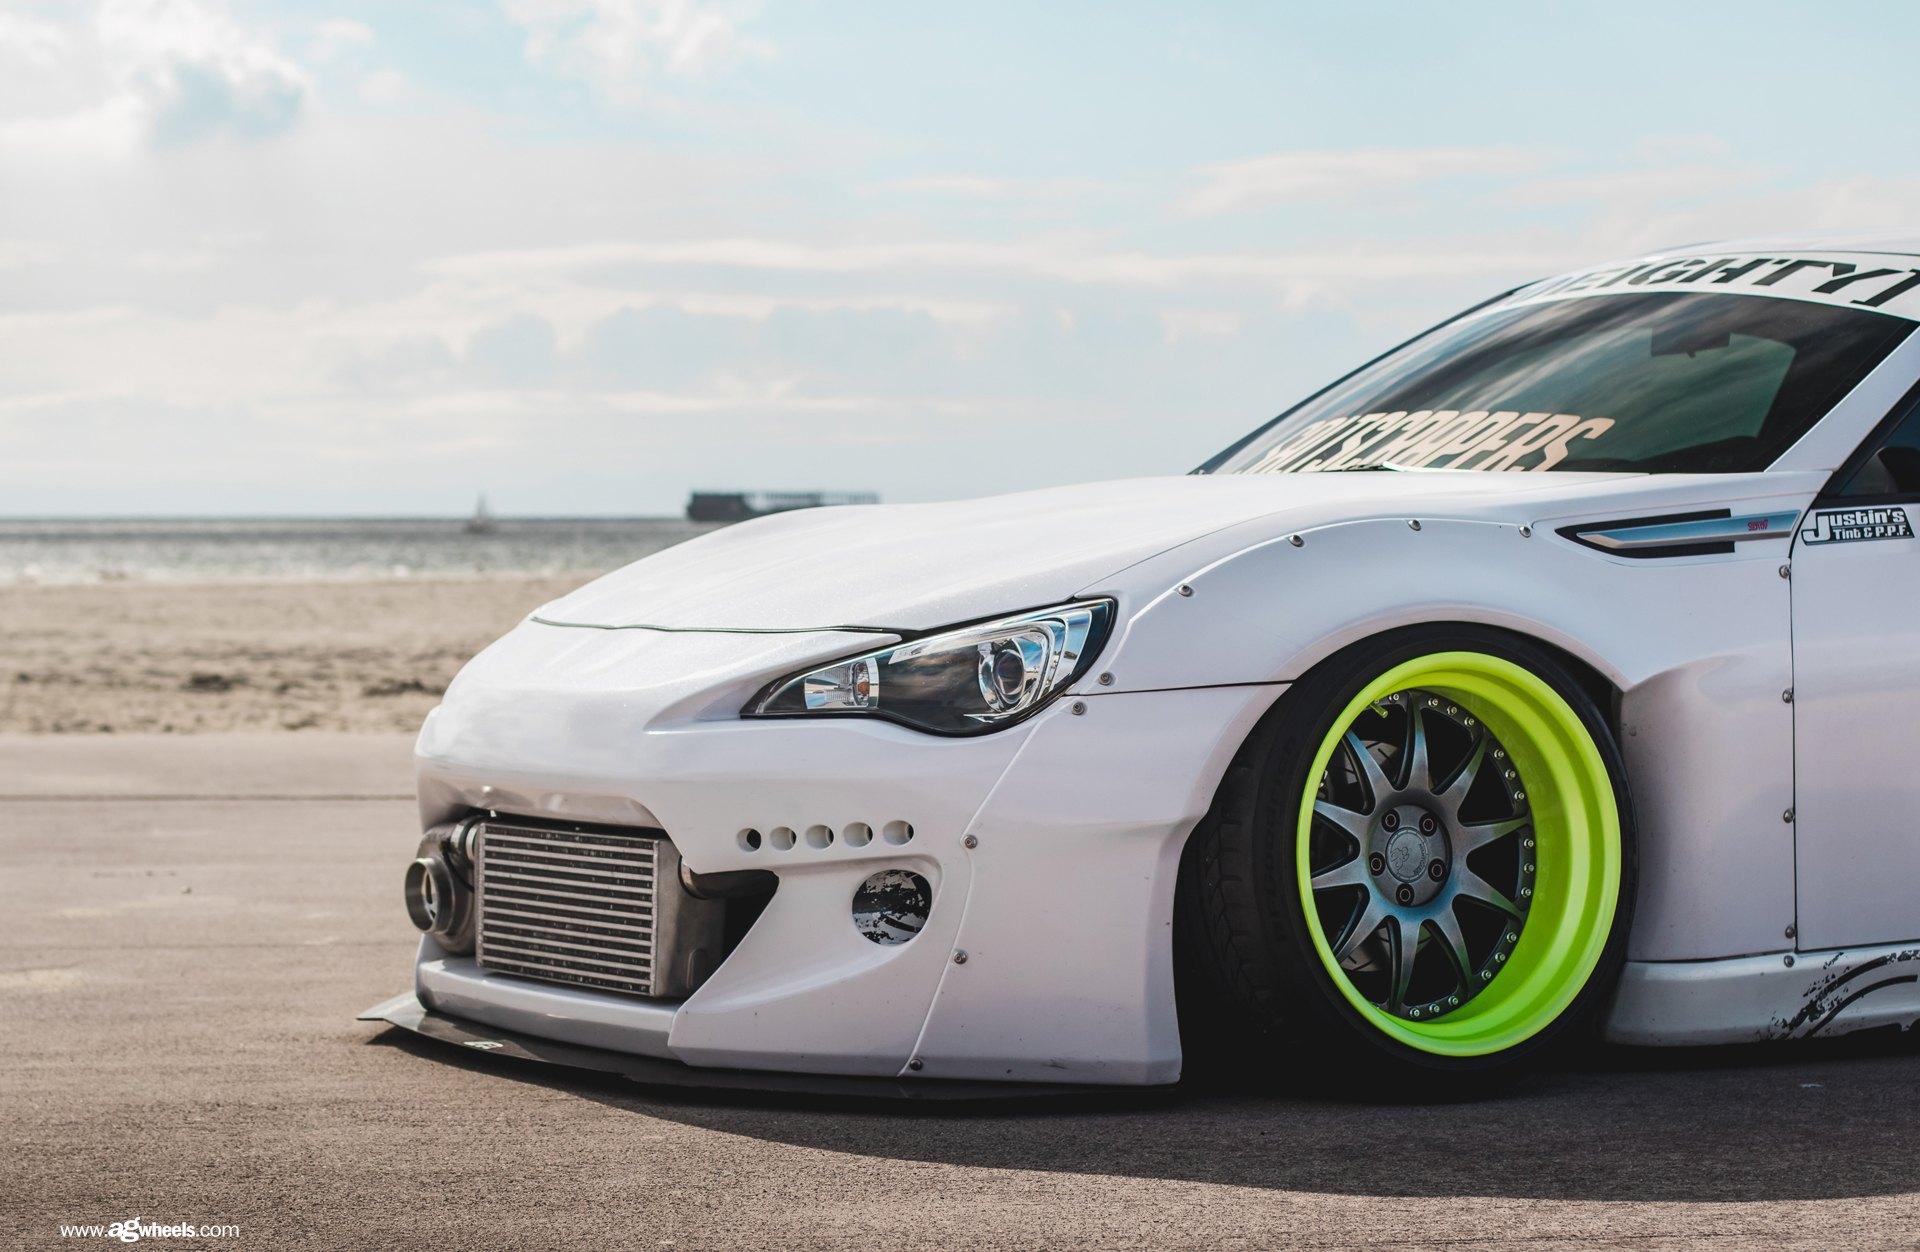 White Subaru BRZ Boasting Amazing Airbrush Paint and ...